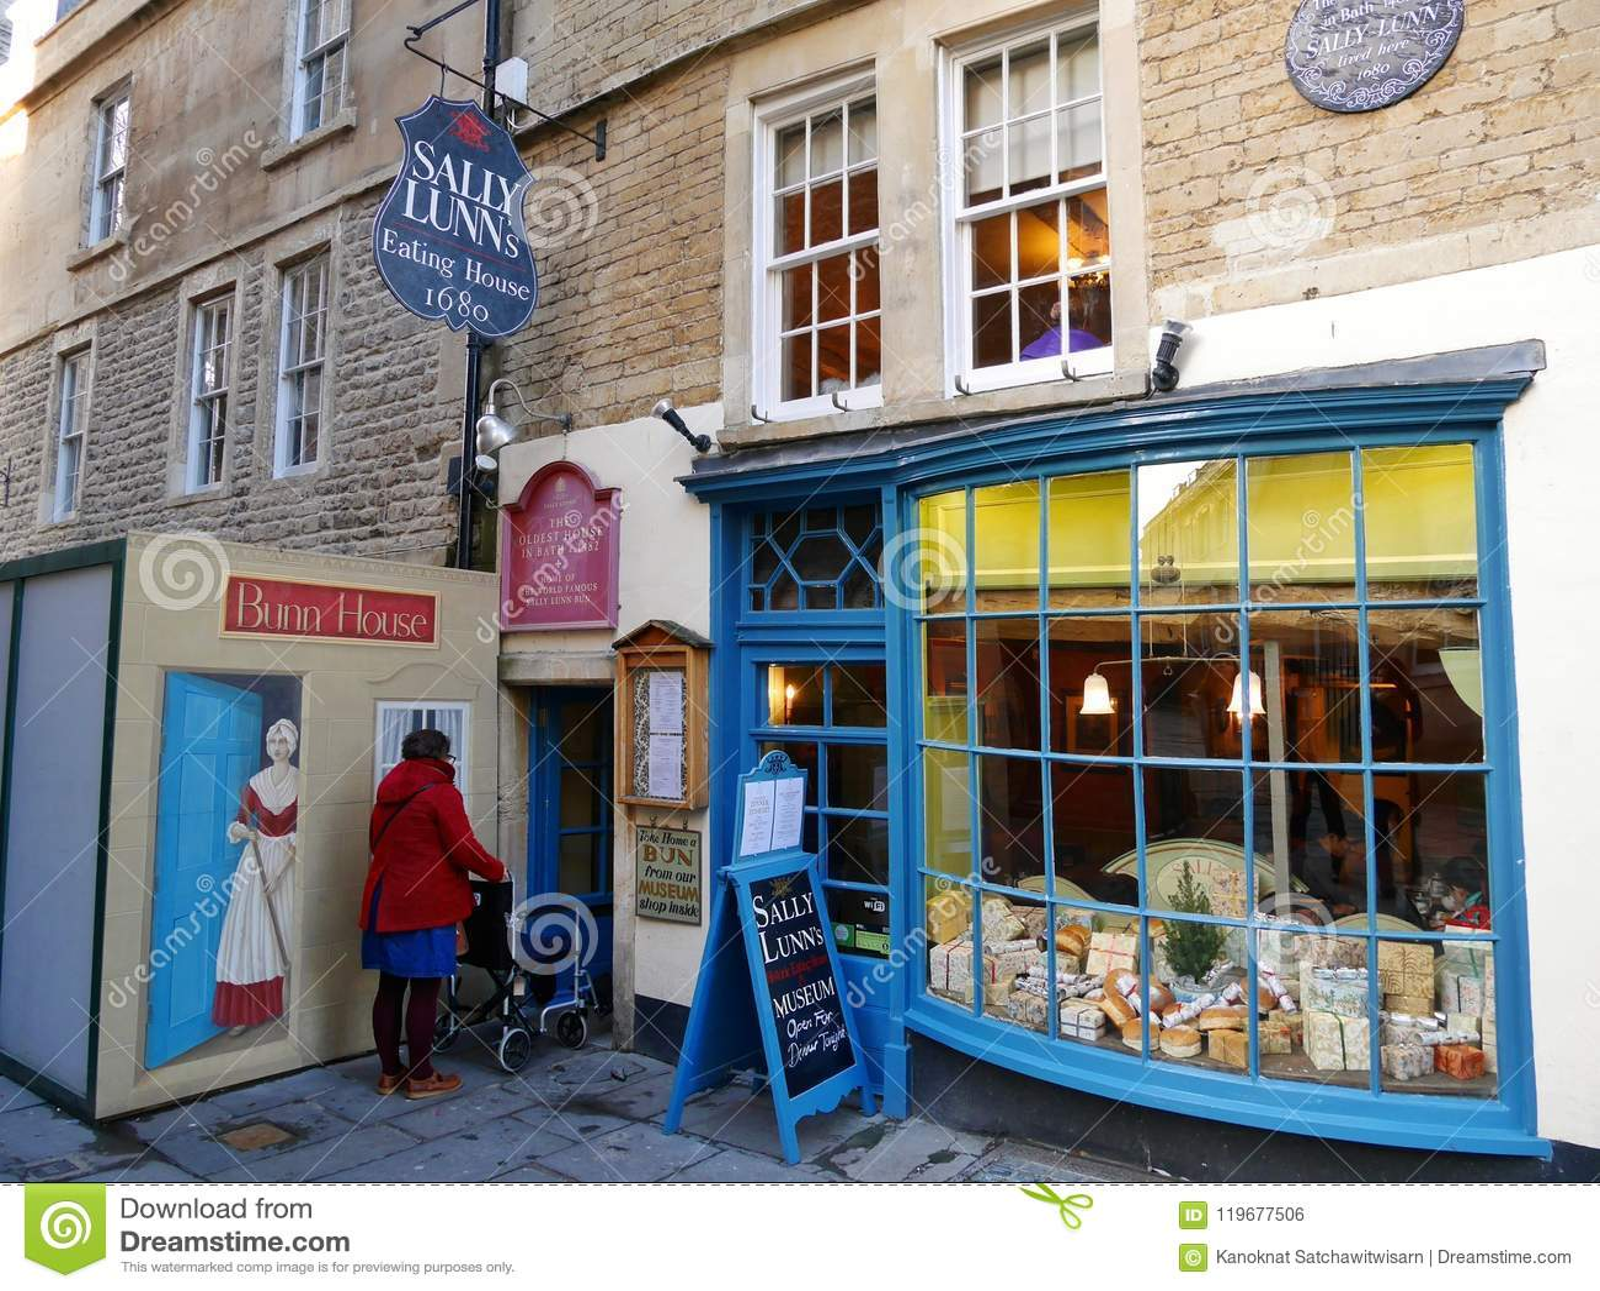 Sally Lunns Restaurant, BATH, ENGLAND, UK Editorial Photo